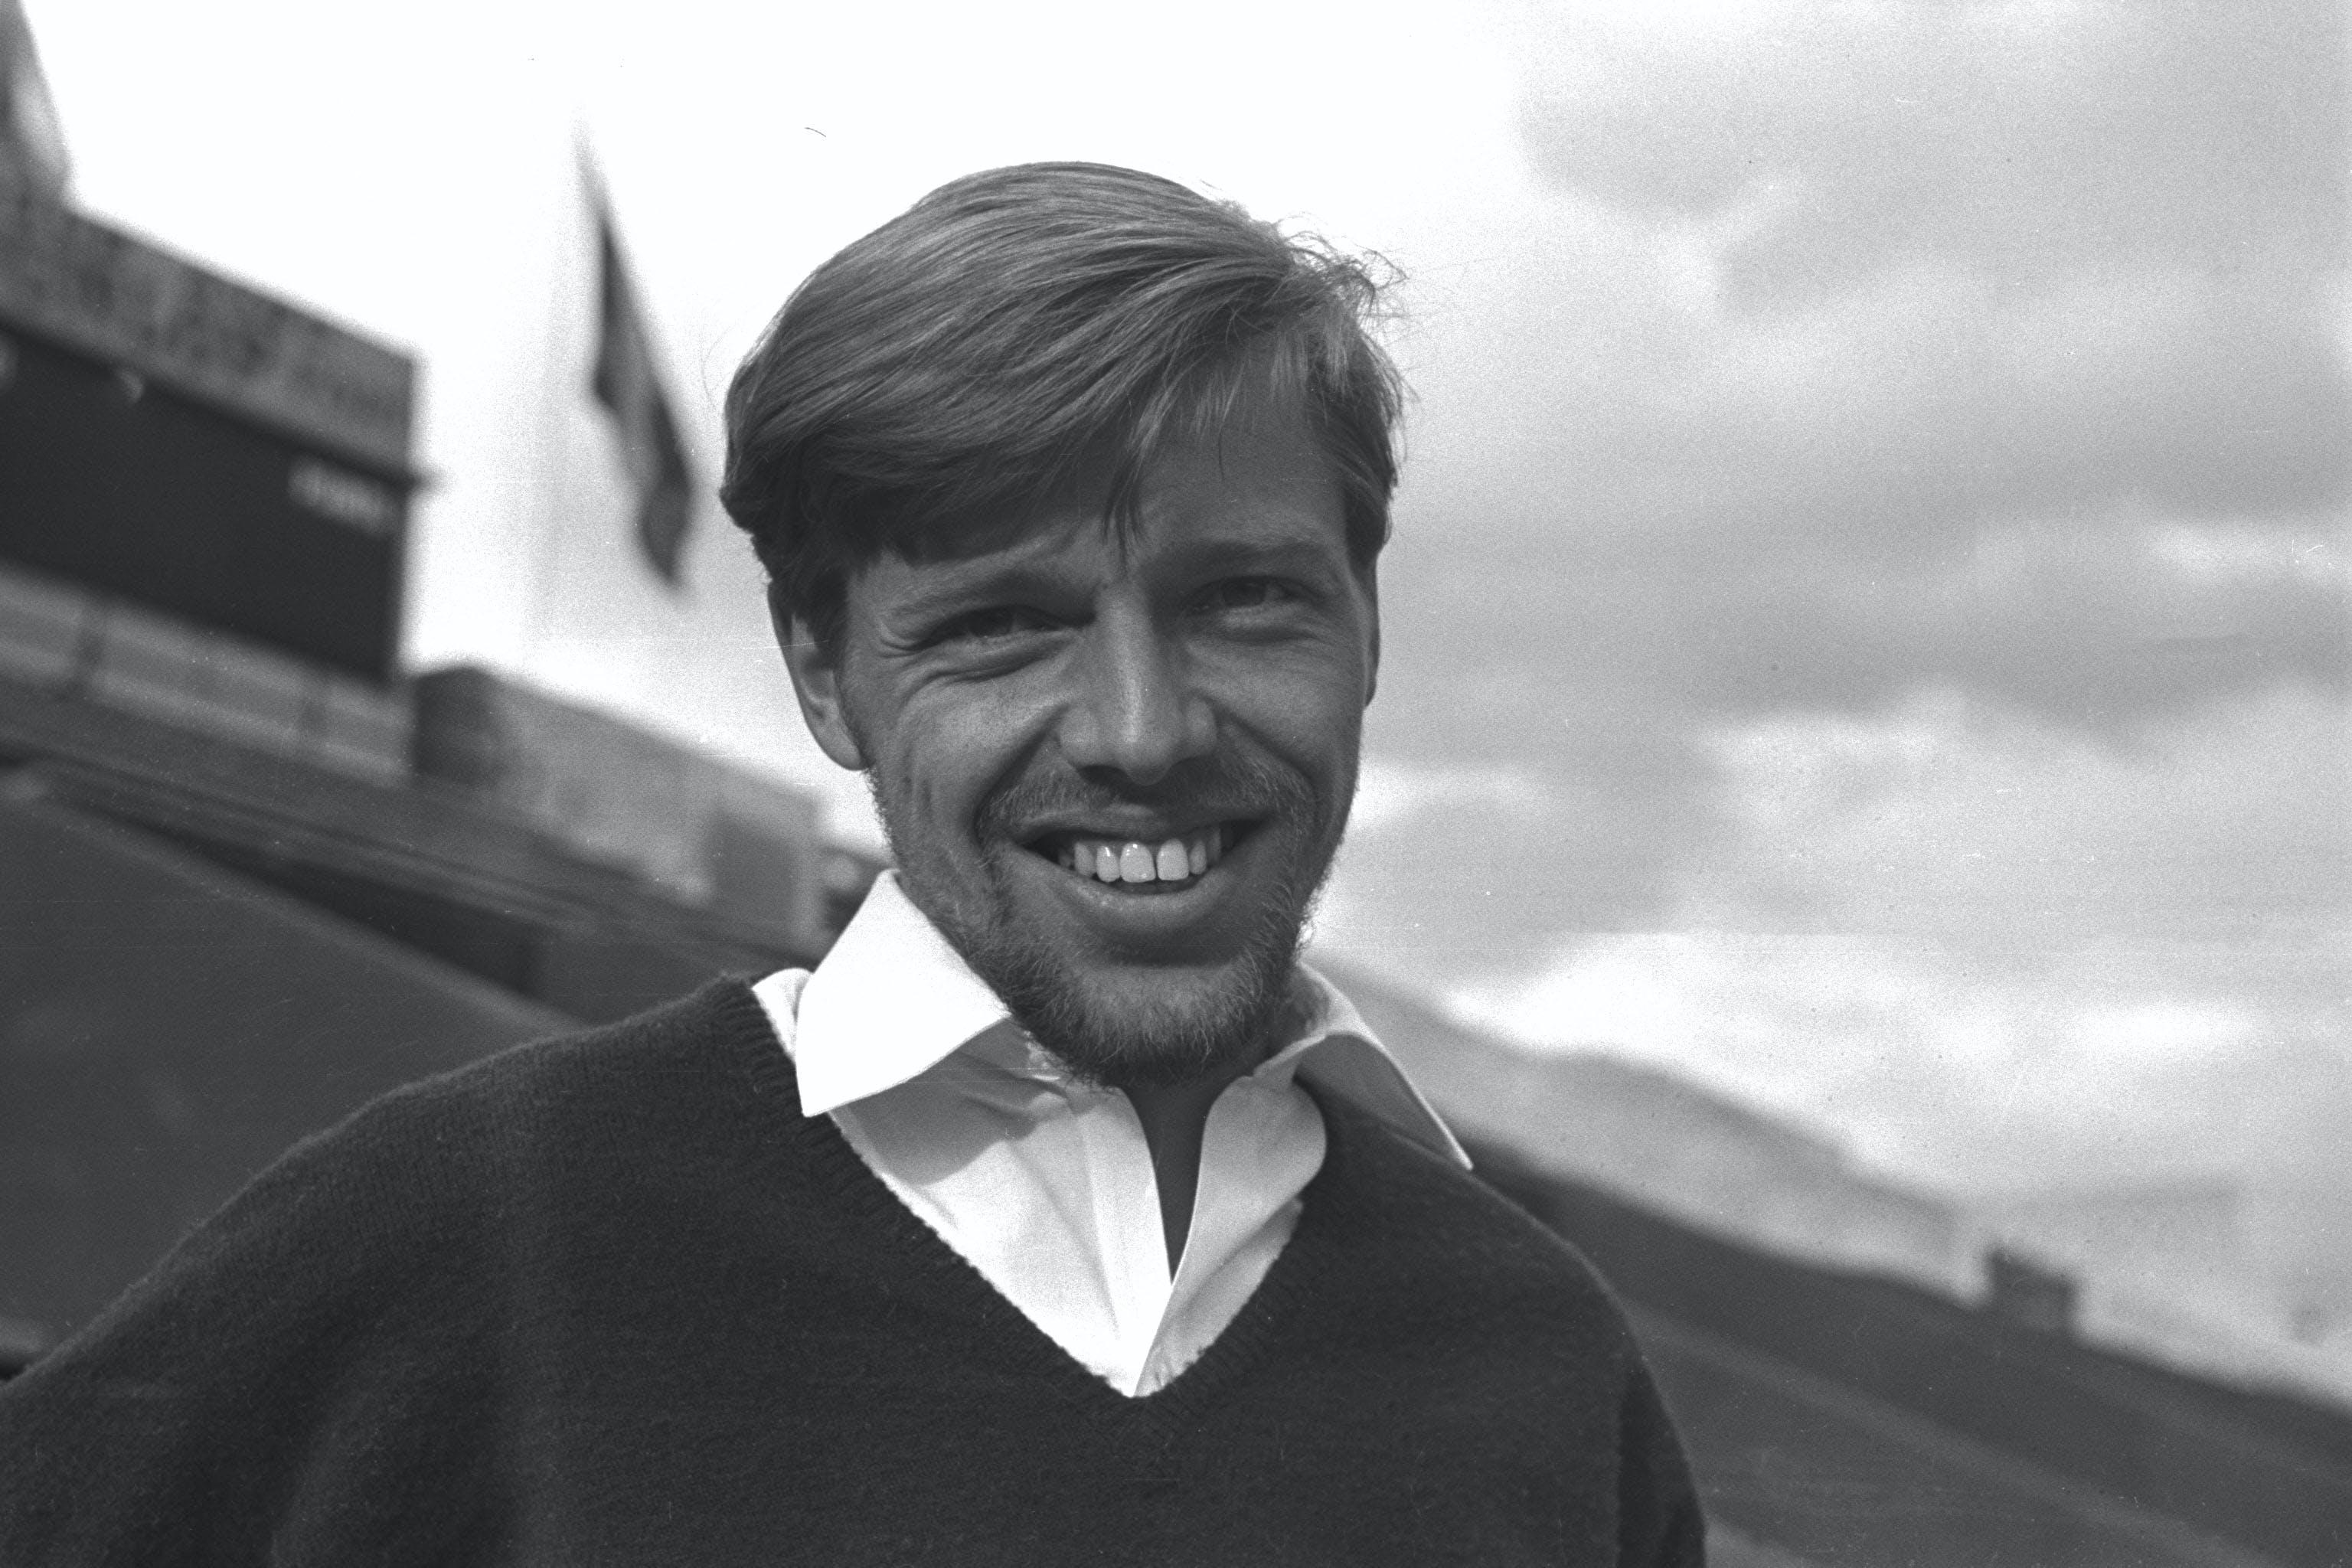 Torben Ulrich smiling at Roland-Garros